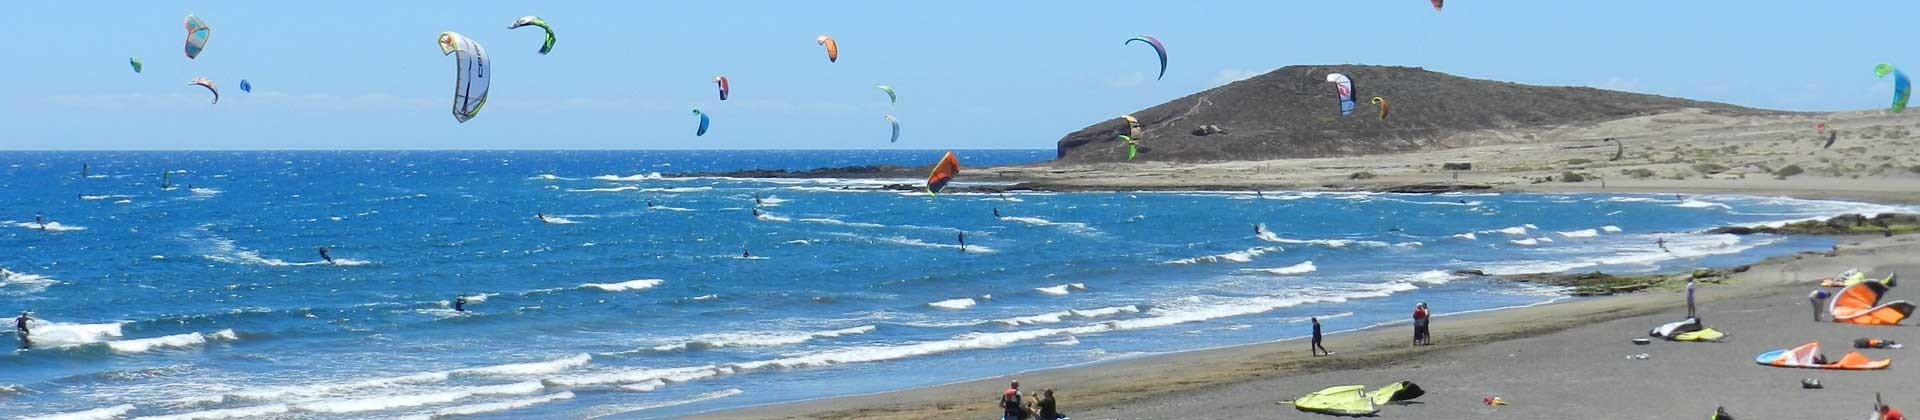 https://www.goodmorningtenerife.com/wp-content/uploads/2014/08/02_slide_windsurfing_GM_Tenerife-1920x420.jpg